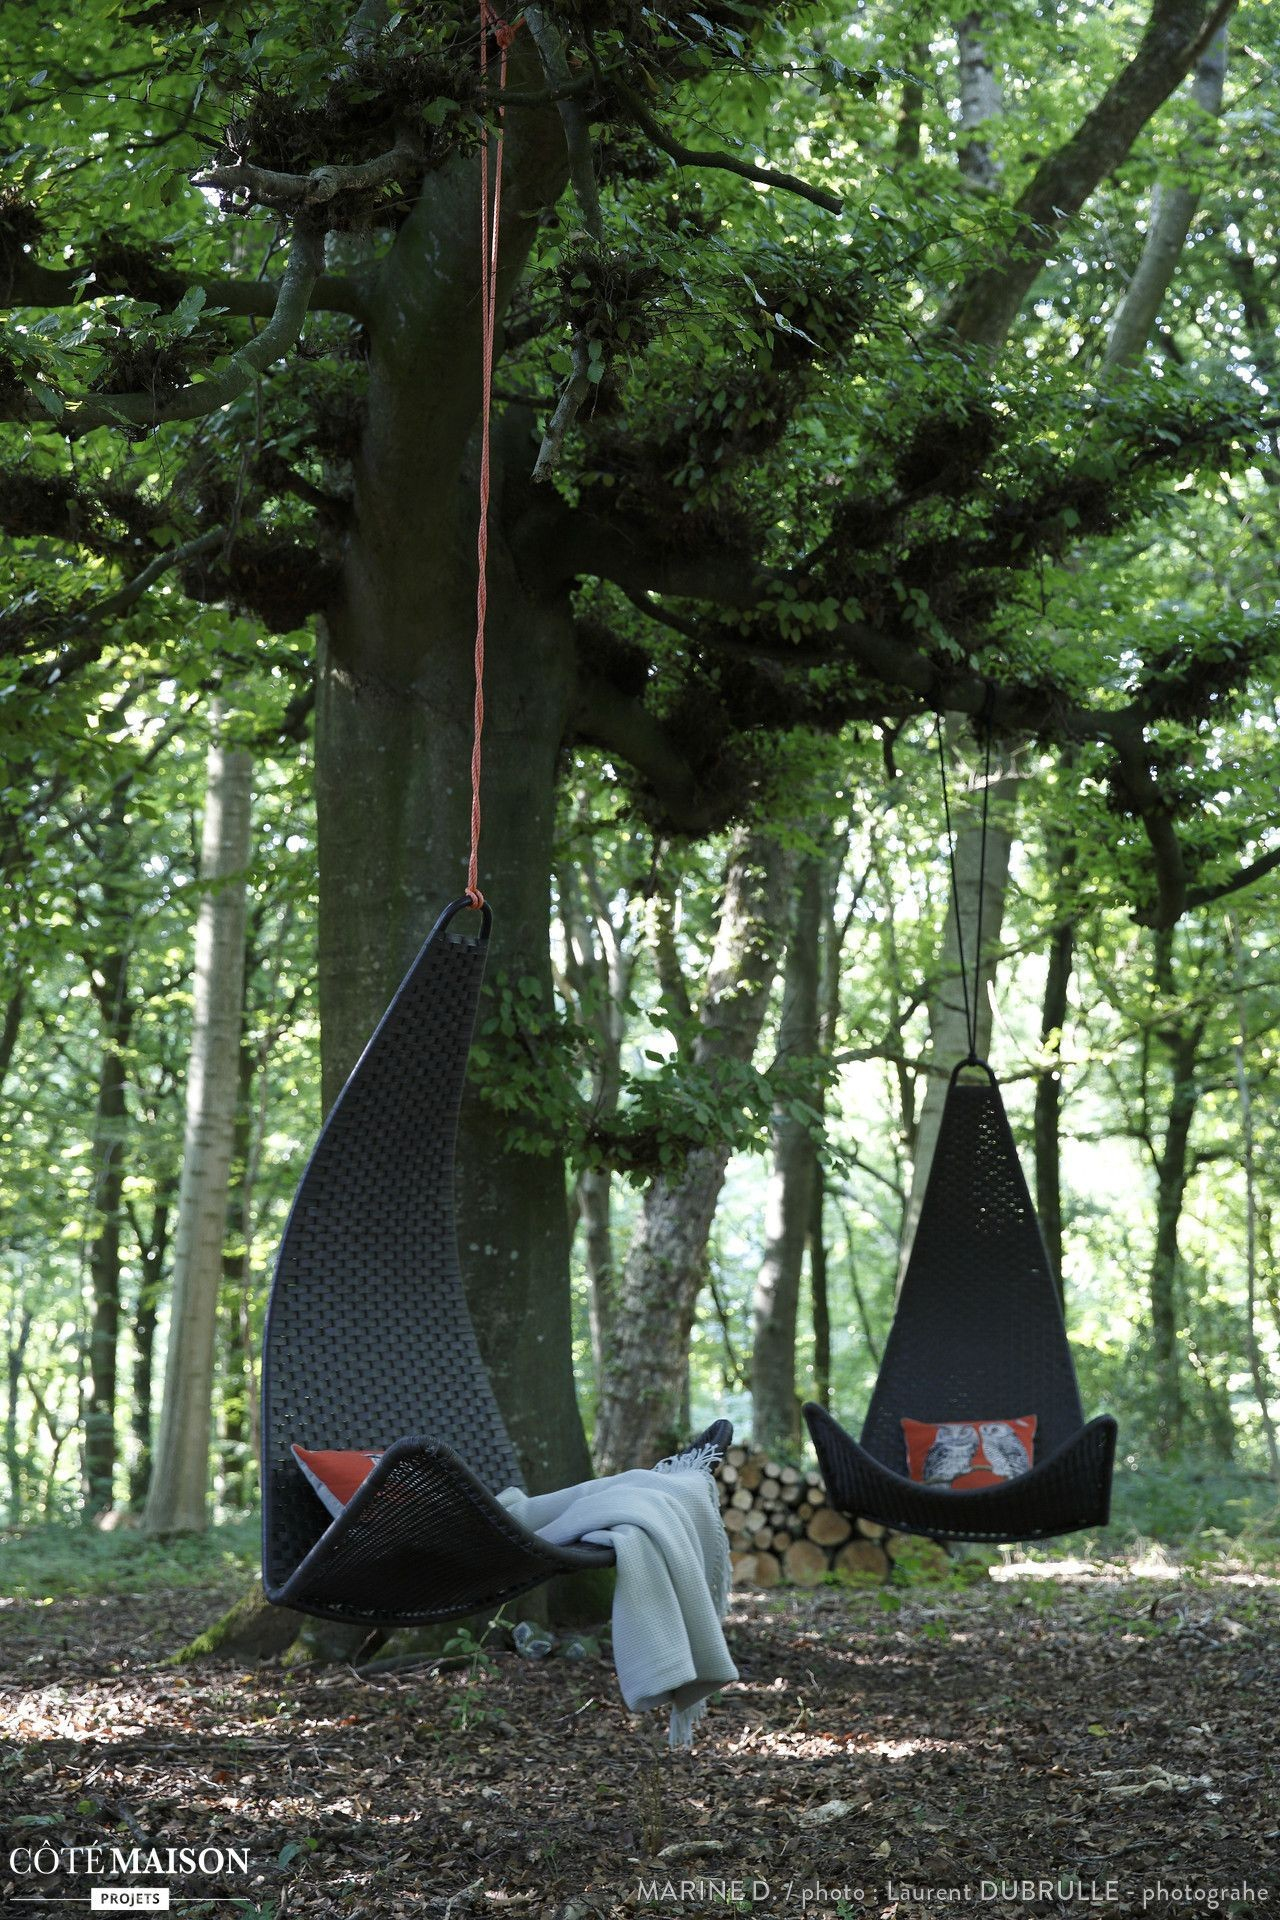 Balancelle Leroy Merlin Élégant Galerie Balancelle De Jardin Leroy Merlin Ainsi Que Simple Meubles De Jardin